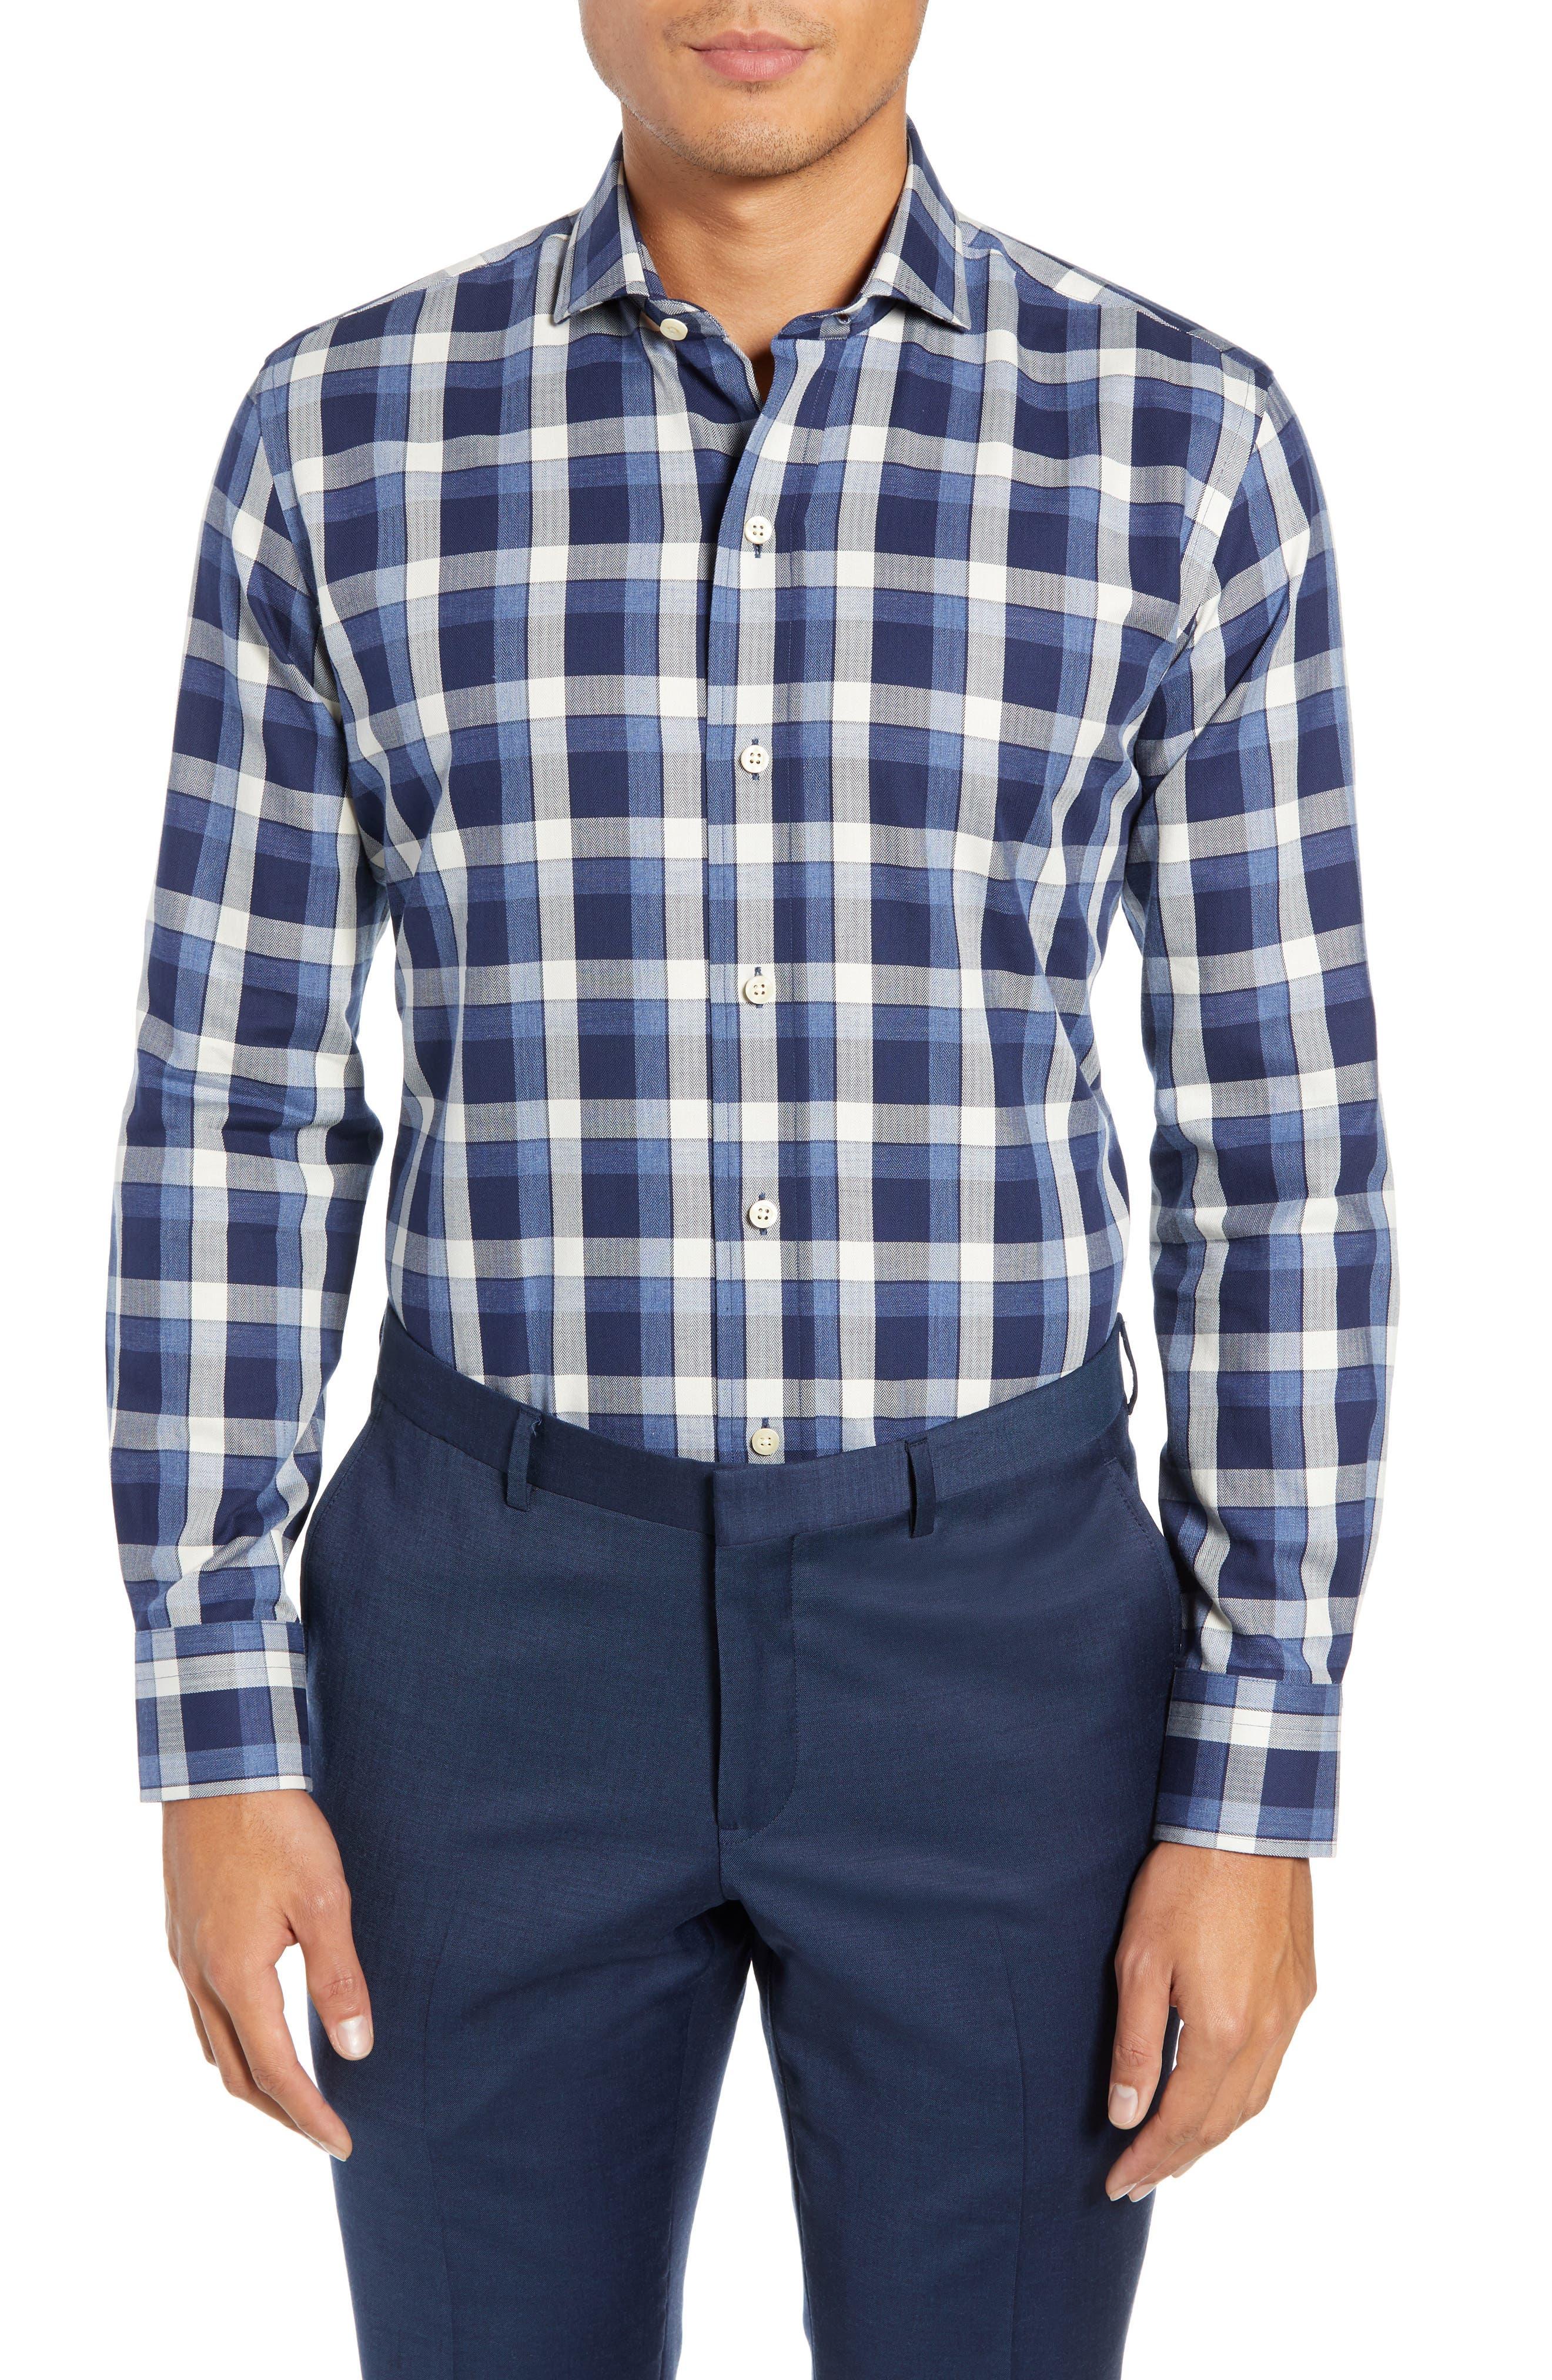 LEDBURY The Dietz Slim Fit Plaid Dress Shirt, Main, color, 410